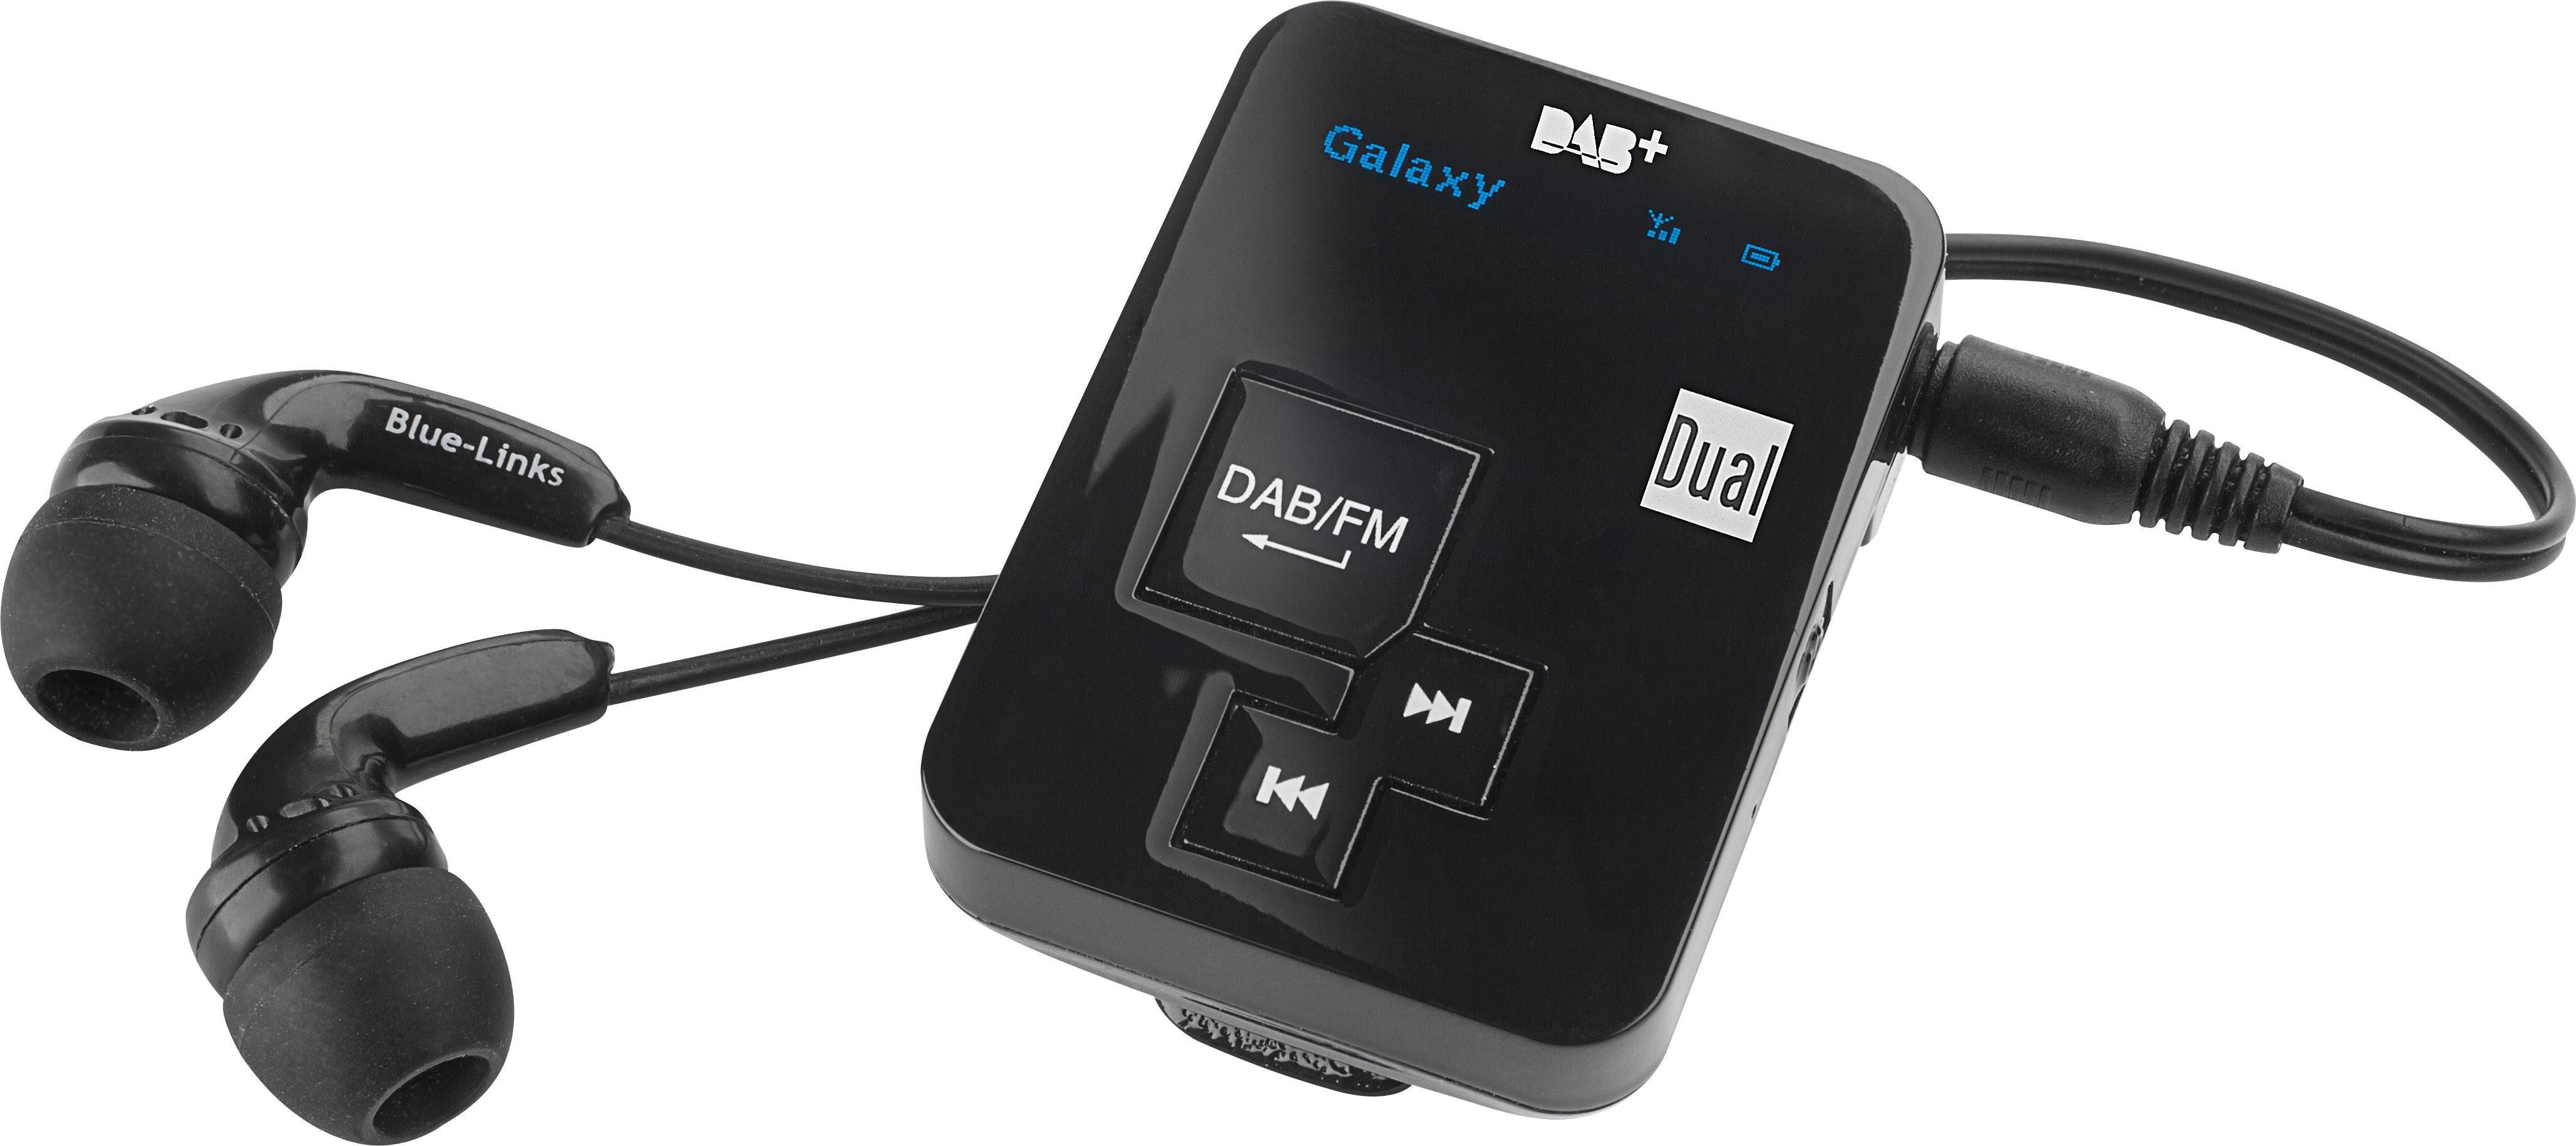 Dual DAB Pocket Radio 2 Portables Digitalradio mit Akku Radio